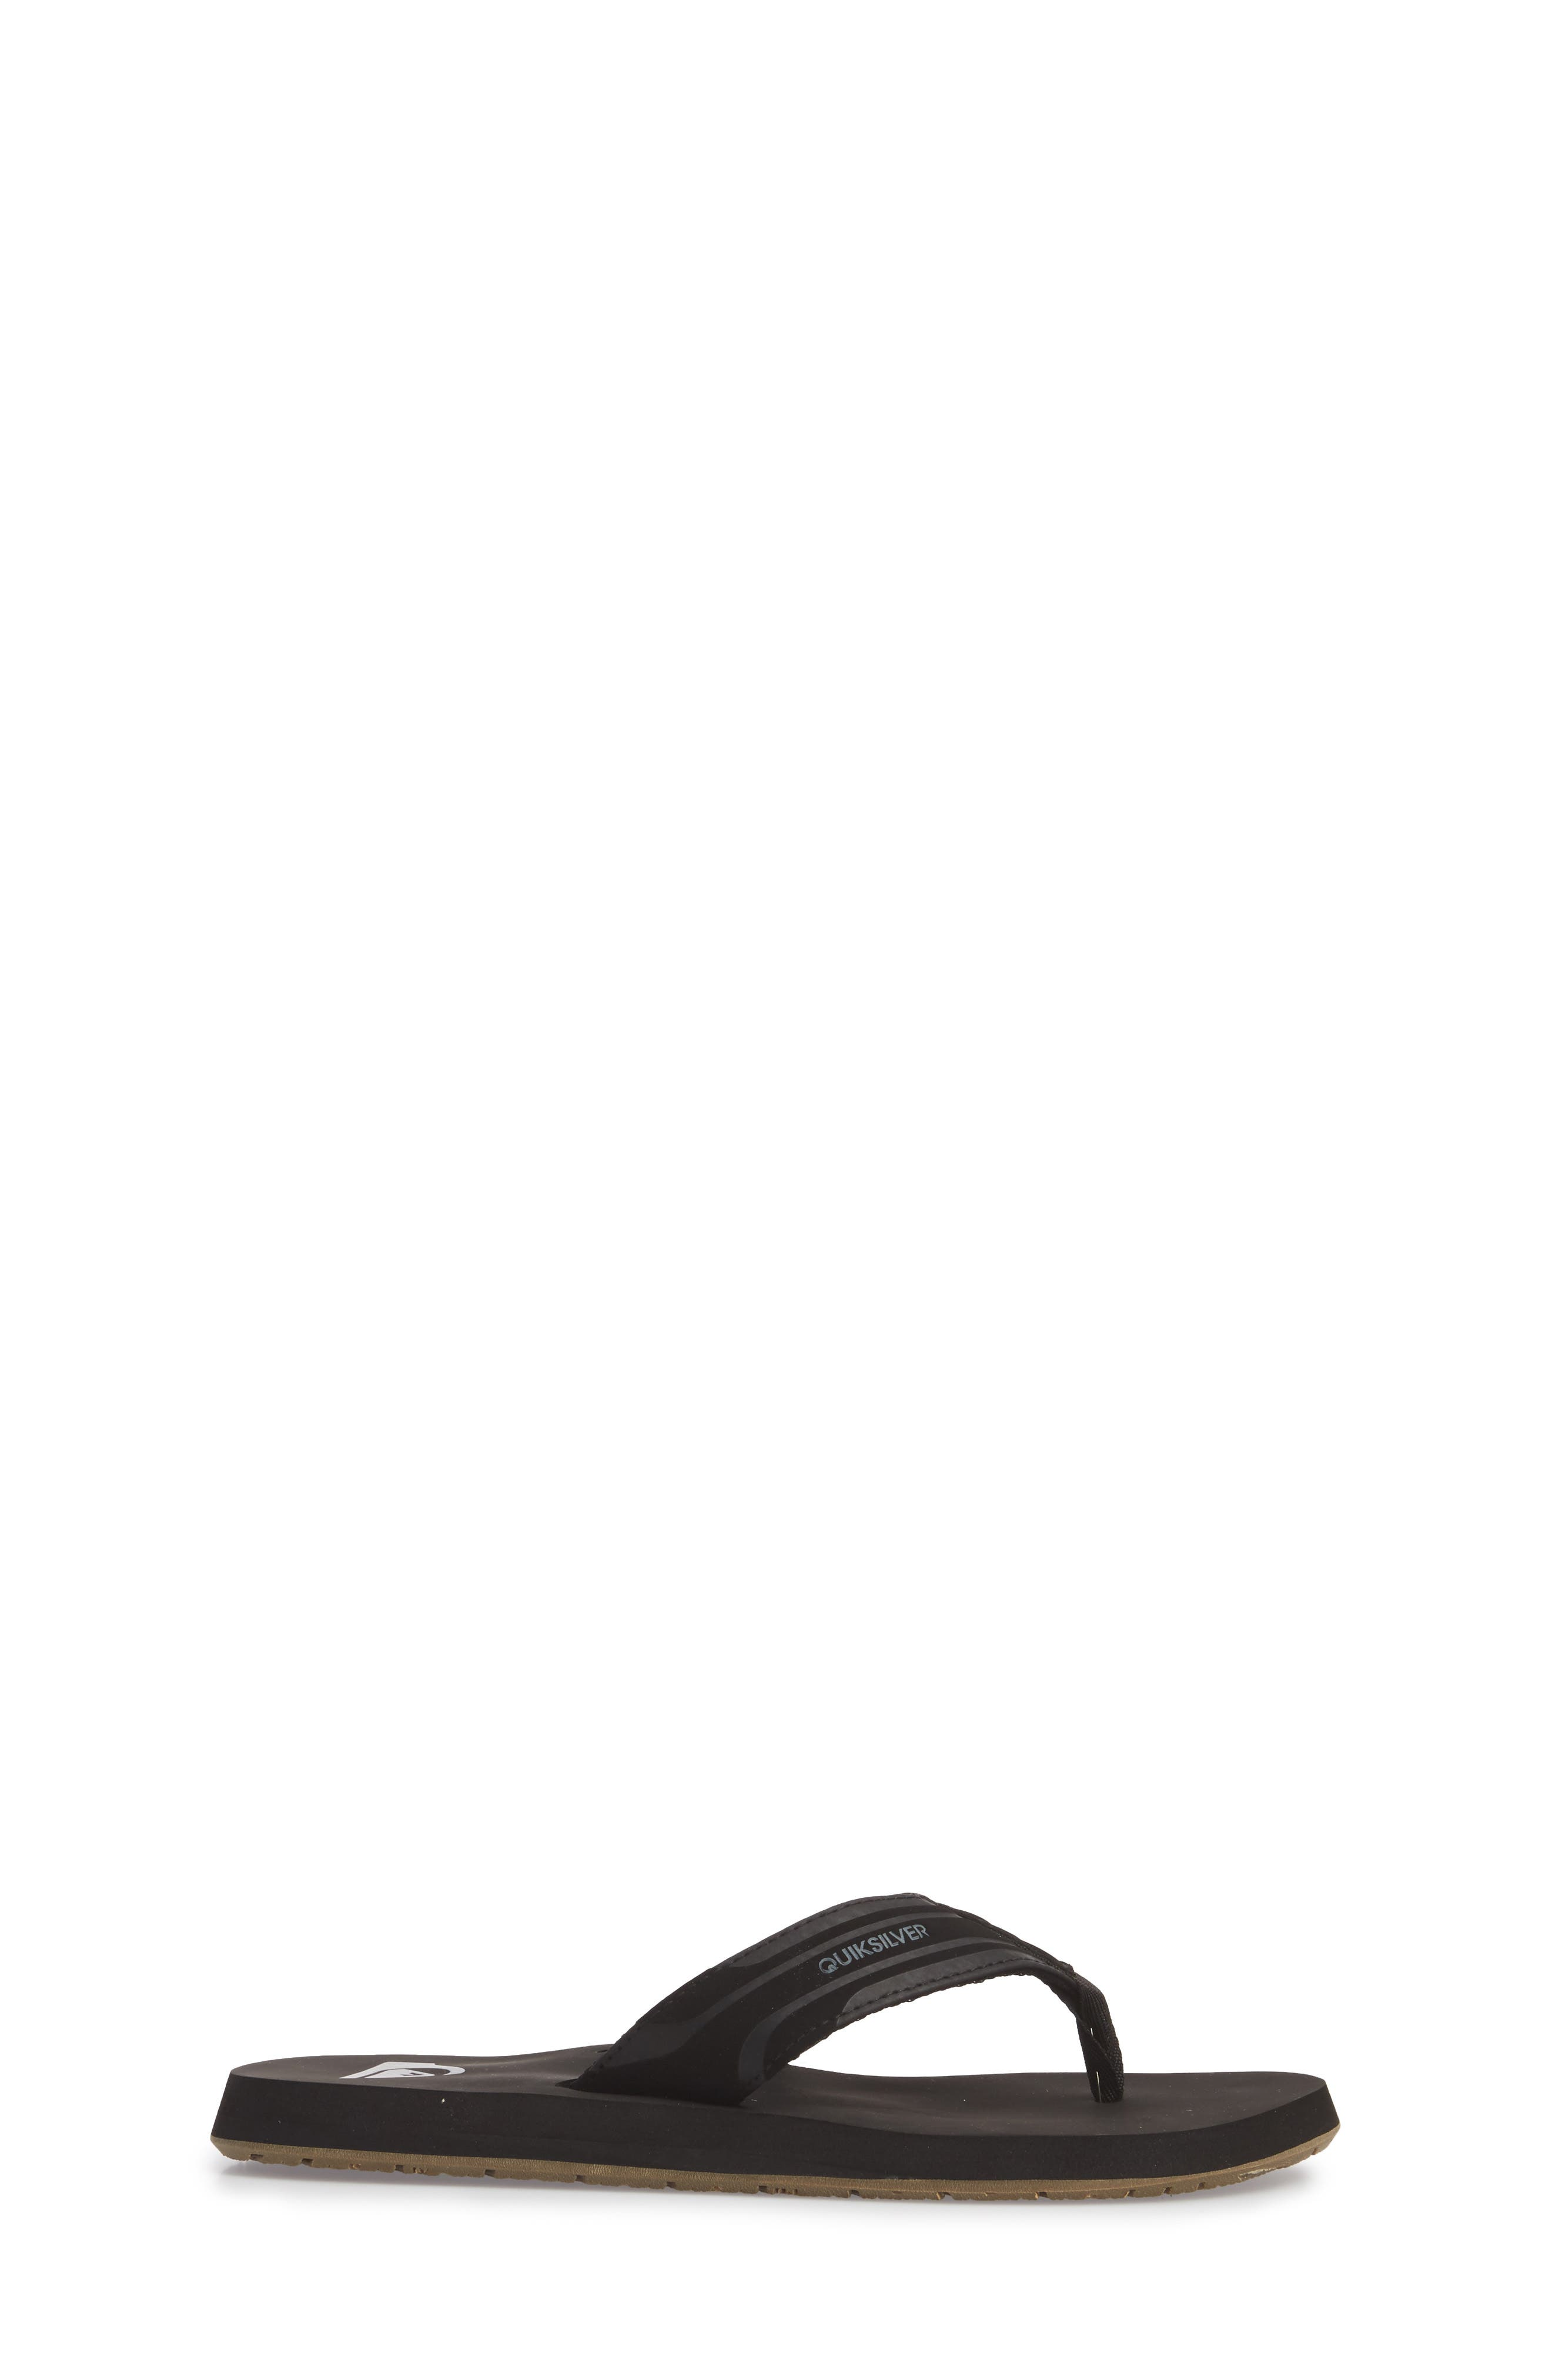 Monkey Wrench Flip Flop,                             Alternate thumbnail 3, color,                             Black/ Brown